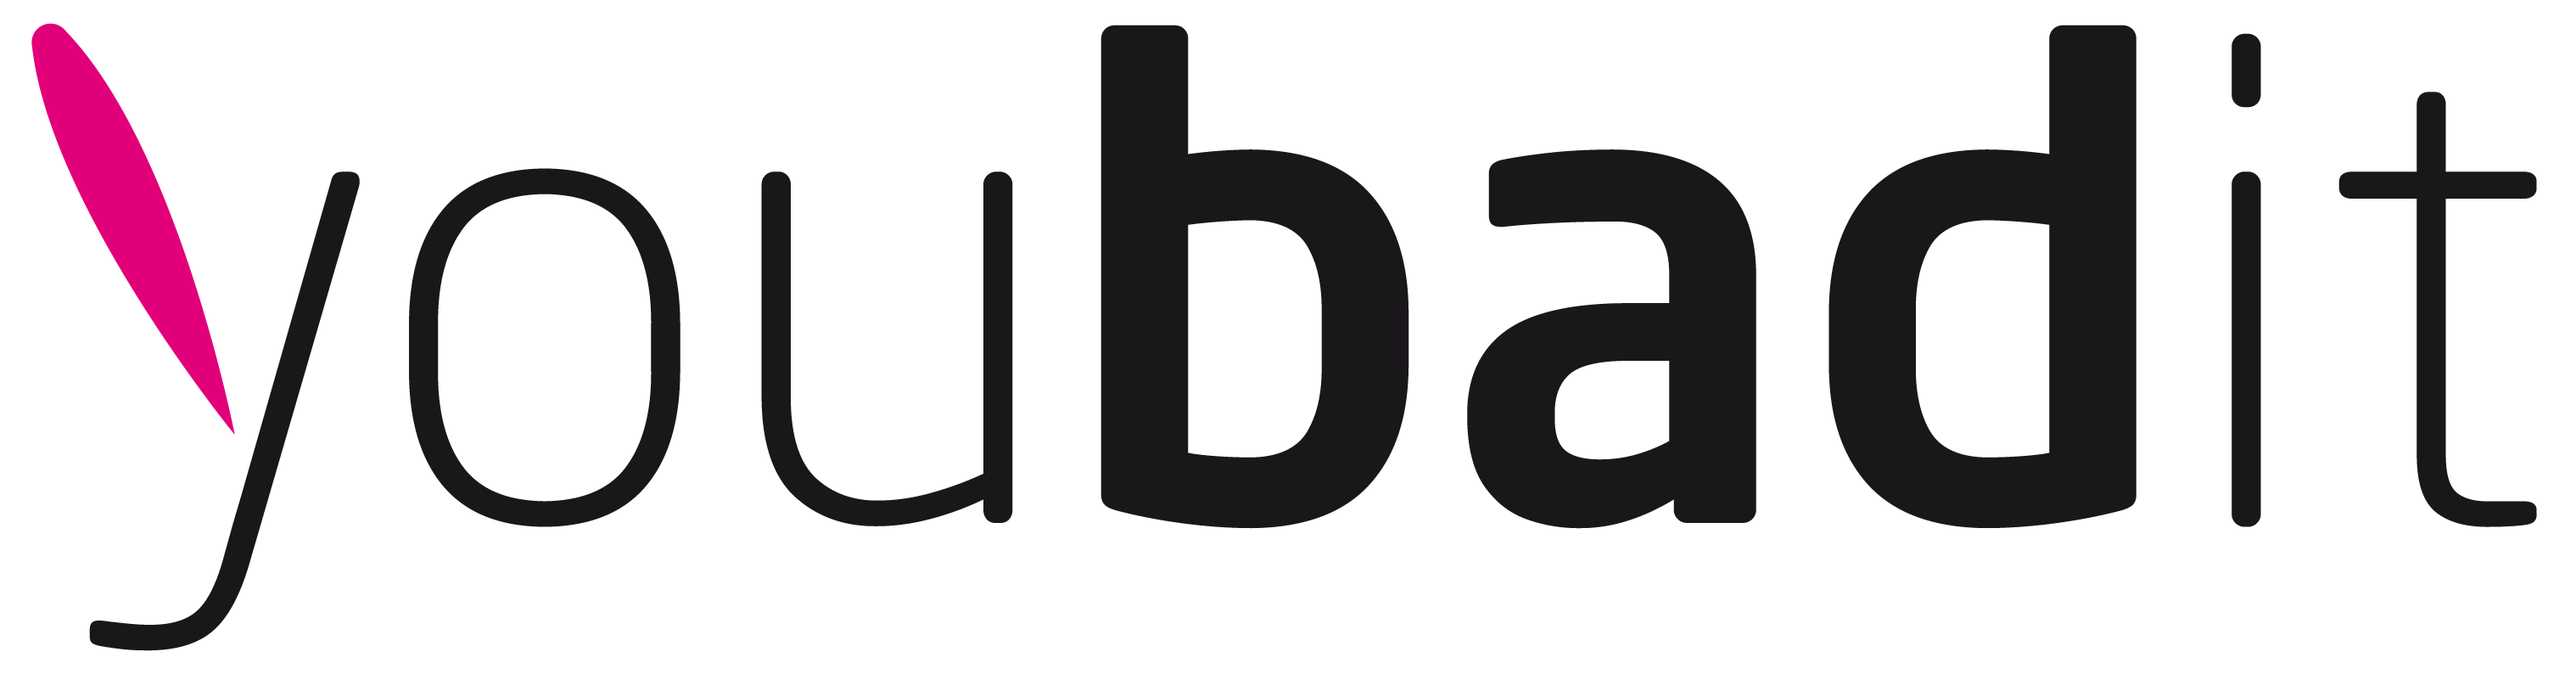 sponsor-youbadit